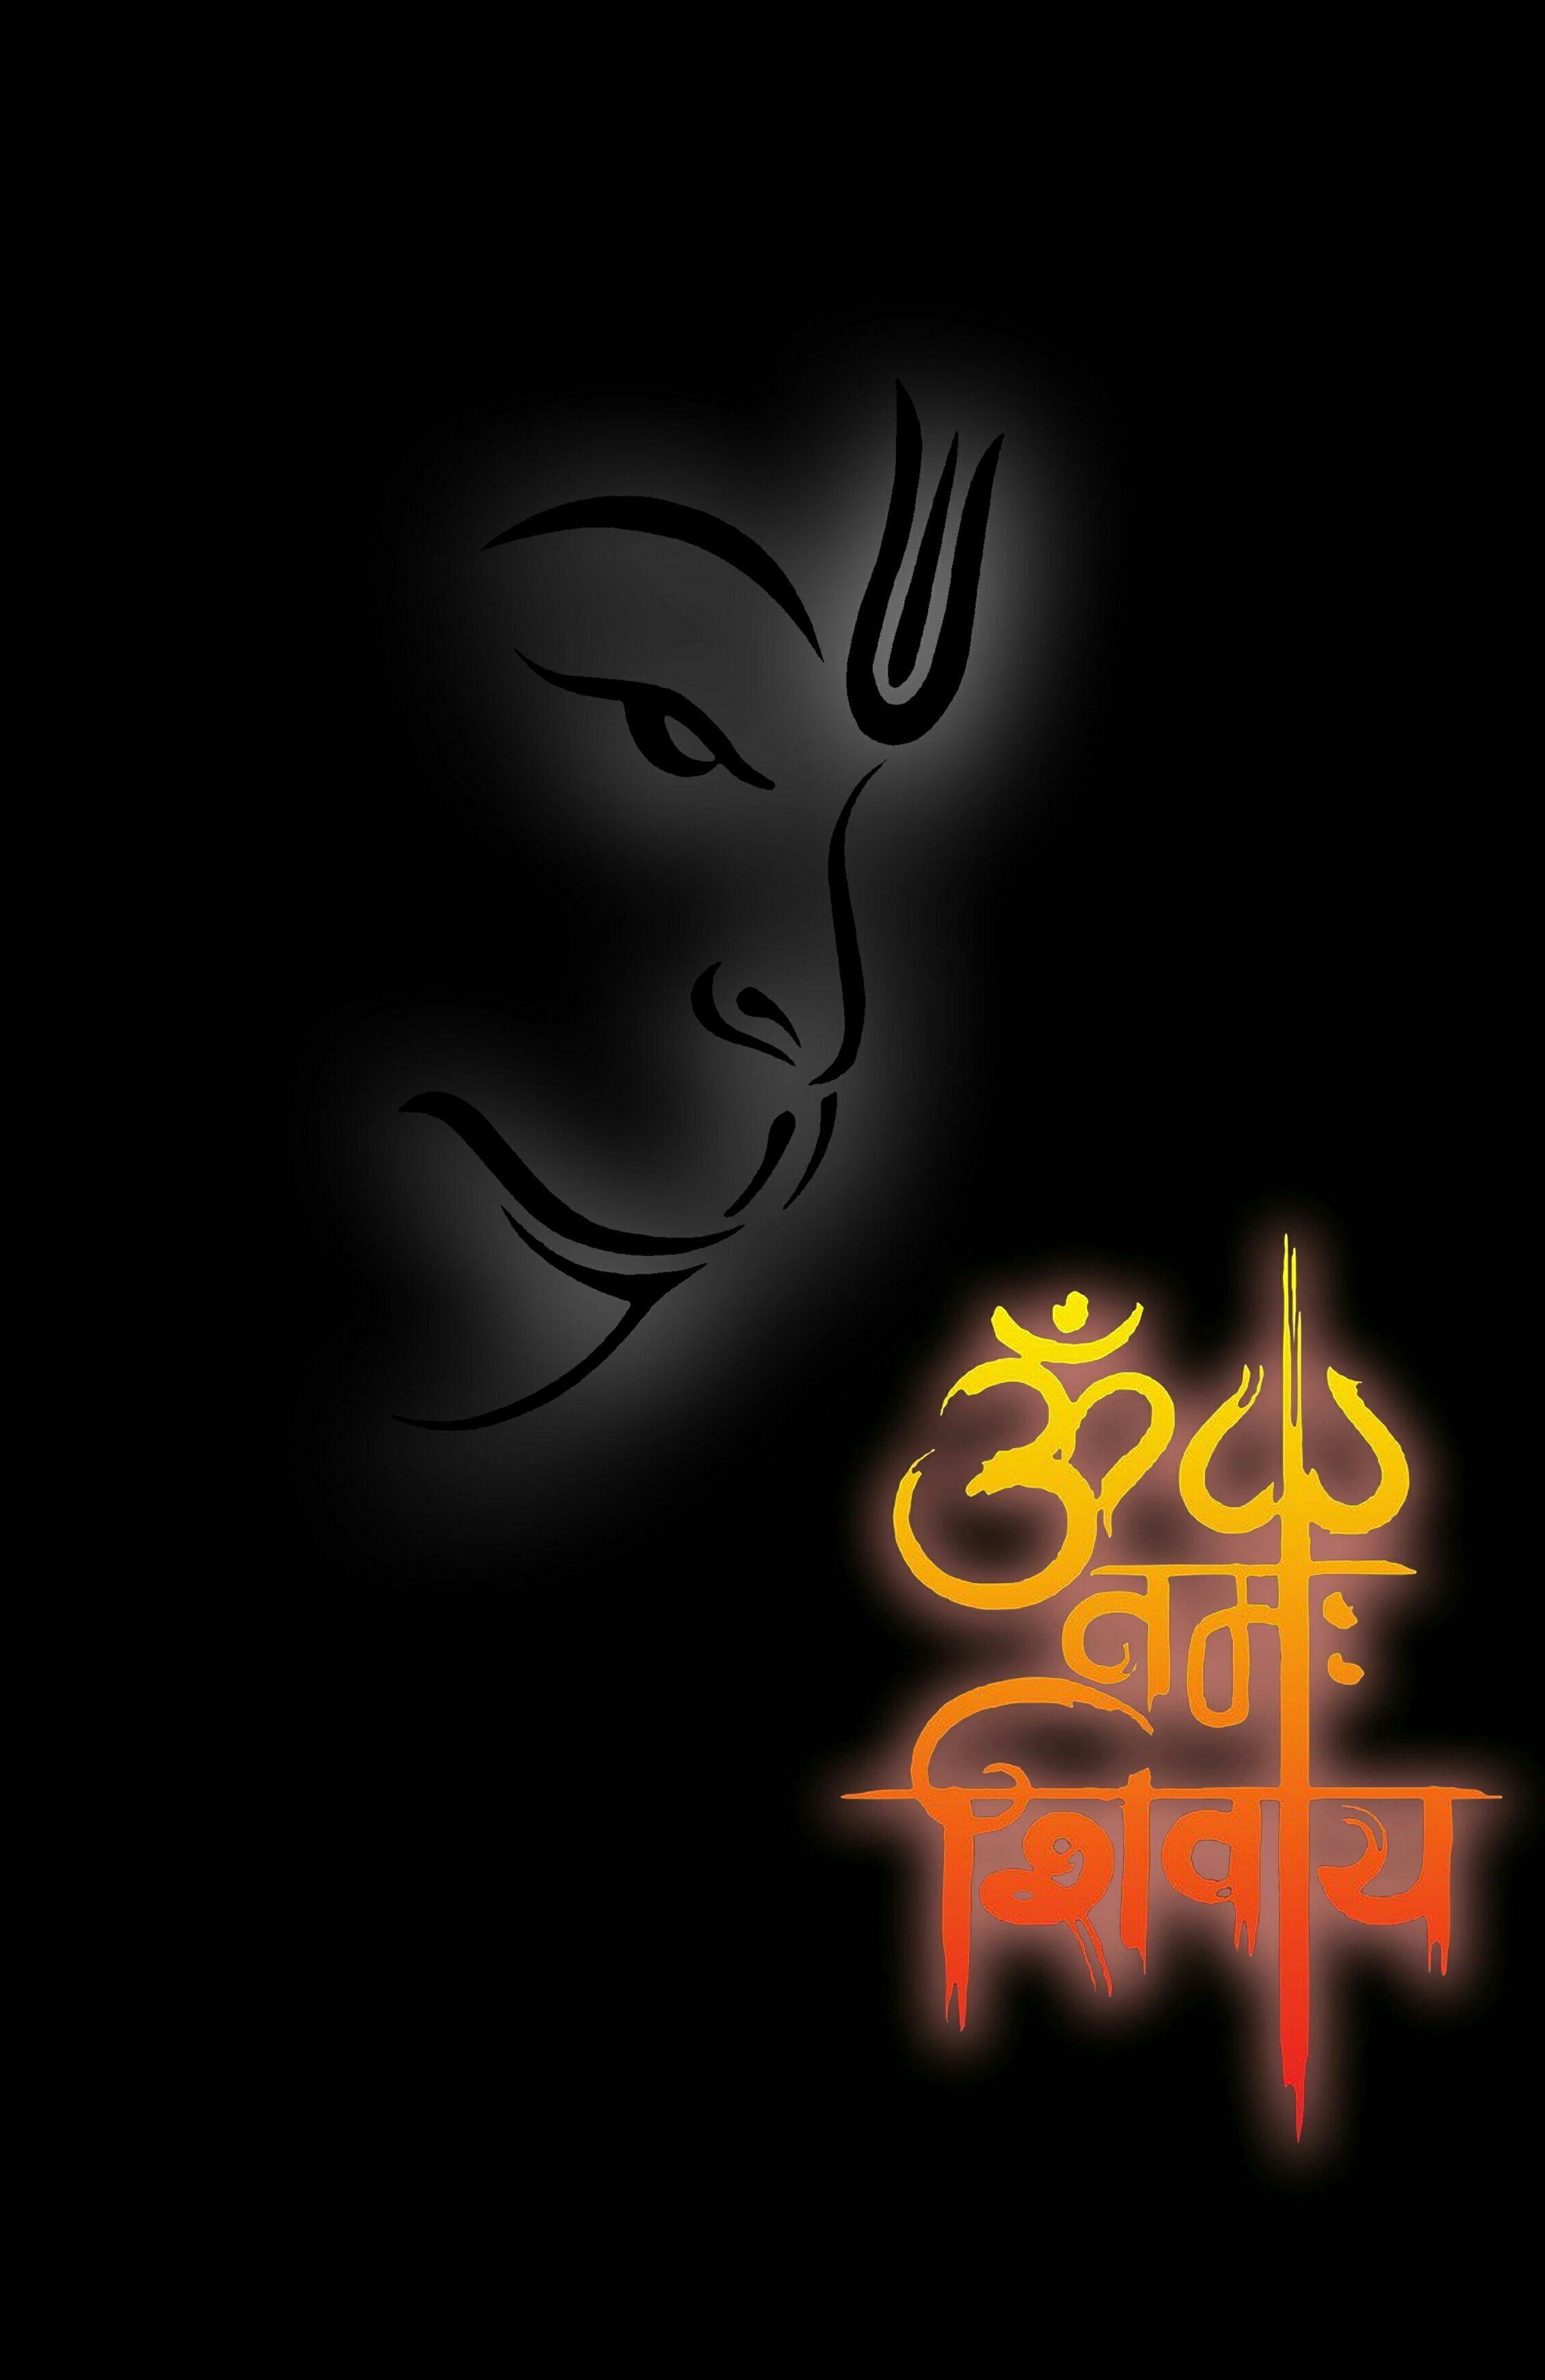 God Hanuman Spritual 2k Wallpaper Hdwallpaper Desktop Hanuman Hd Wallpaper Black Background Wallpaper Black Hd Wallpaper